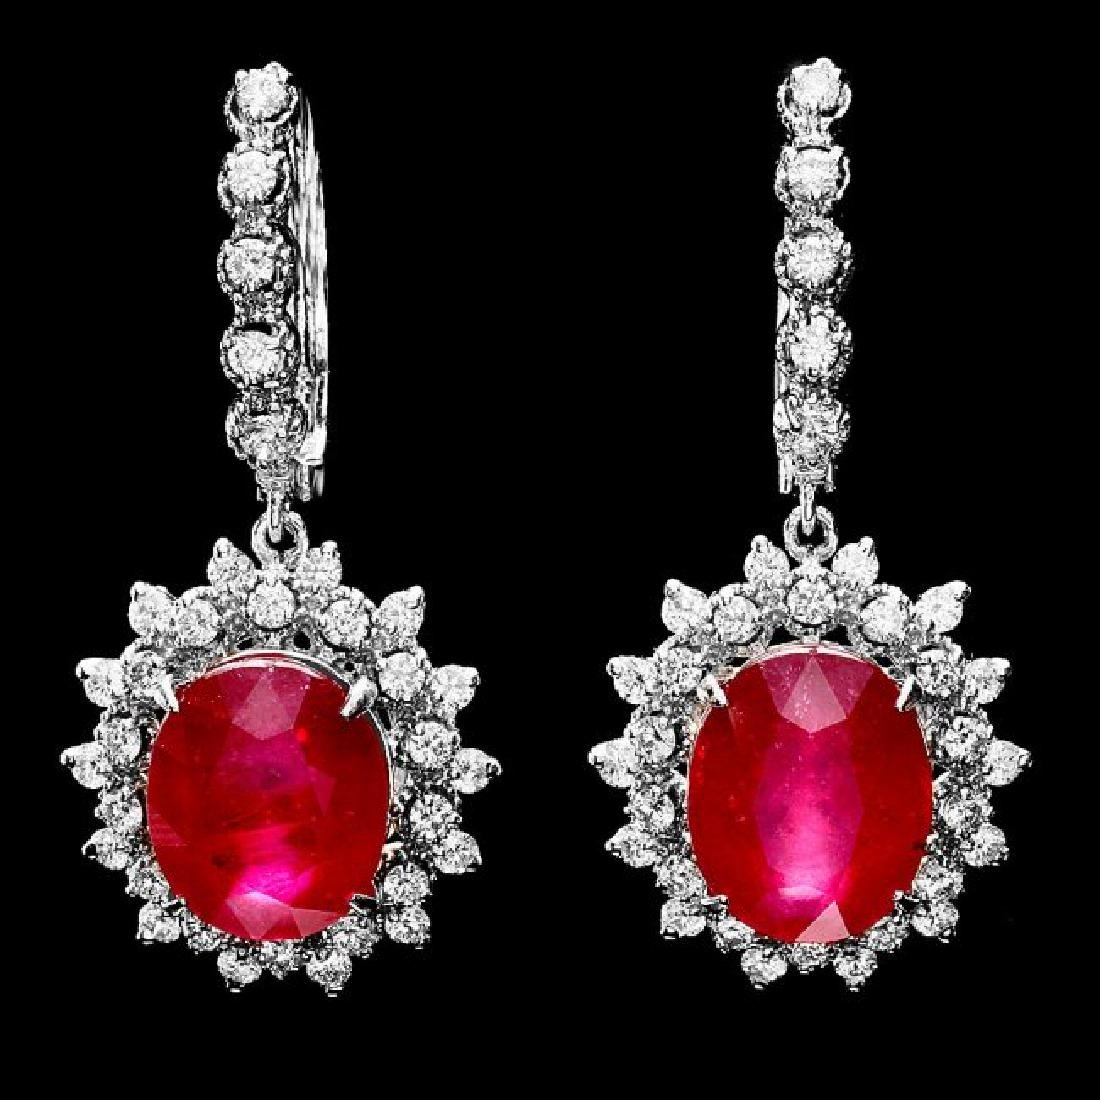 14k Gold 14.15ct Ruby 1.80ct Diamond Earrings